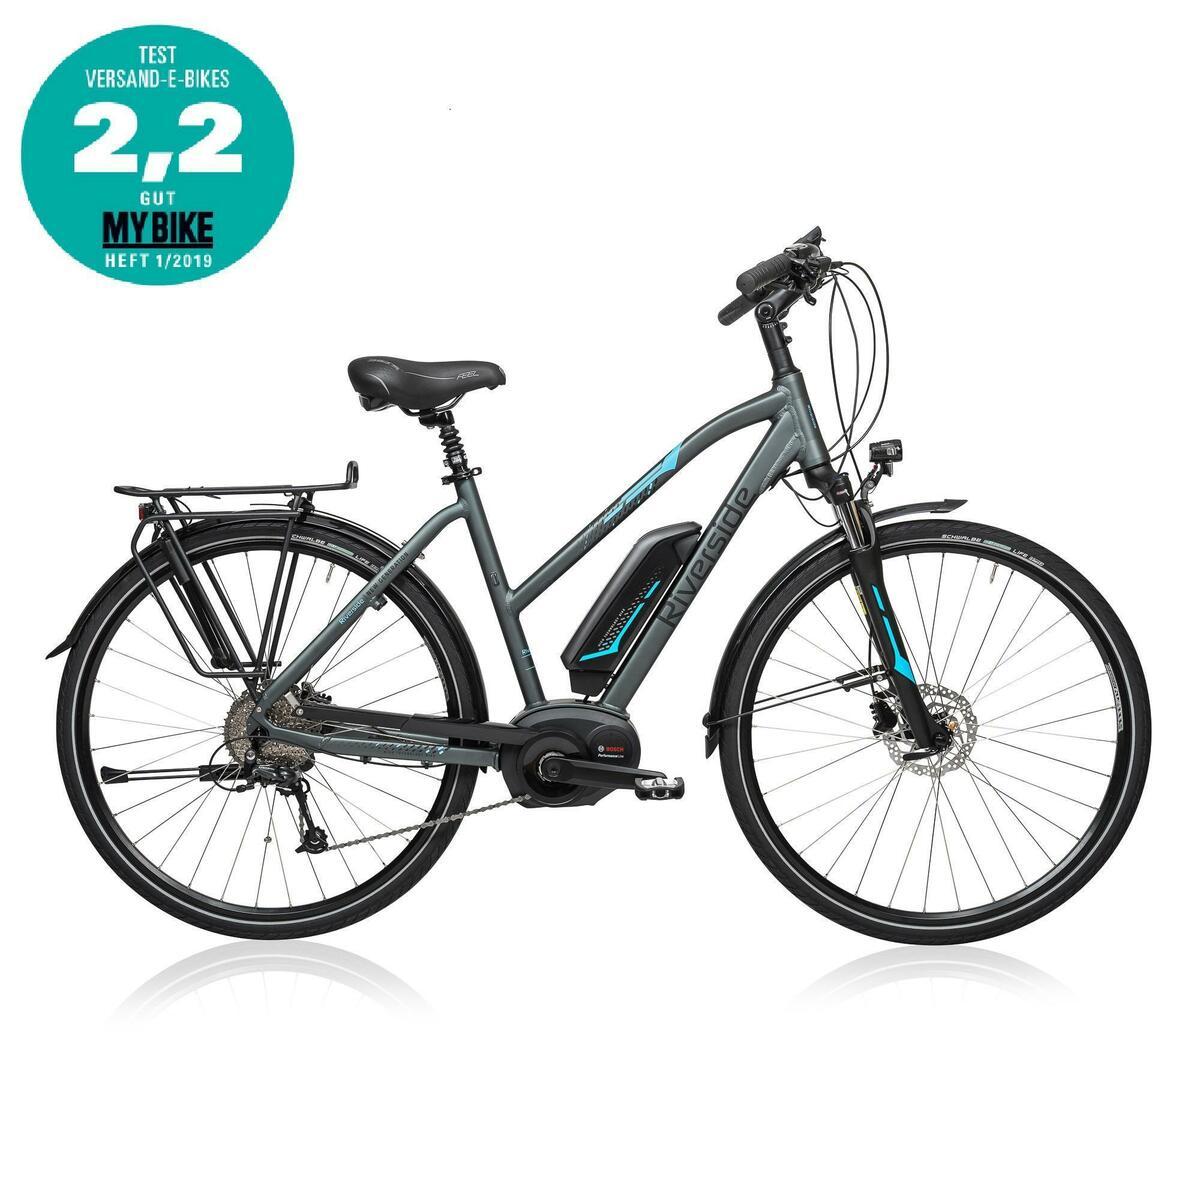 Bild 1 von E-Bike 28 Trekkingrad Riverside 500 Damen Performance Line 400Wh grau/blau